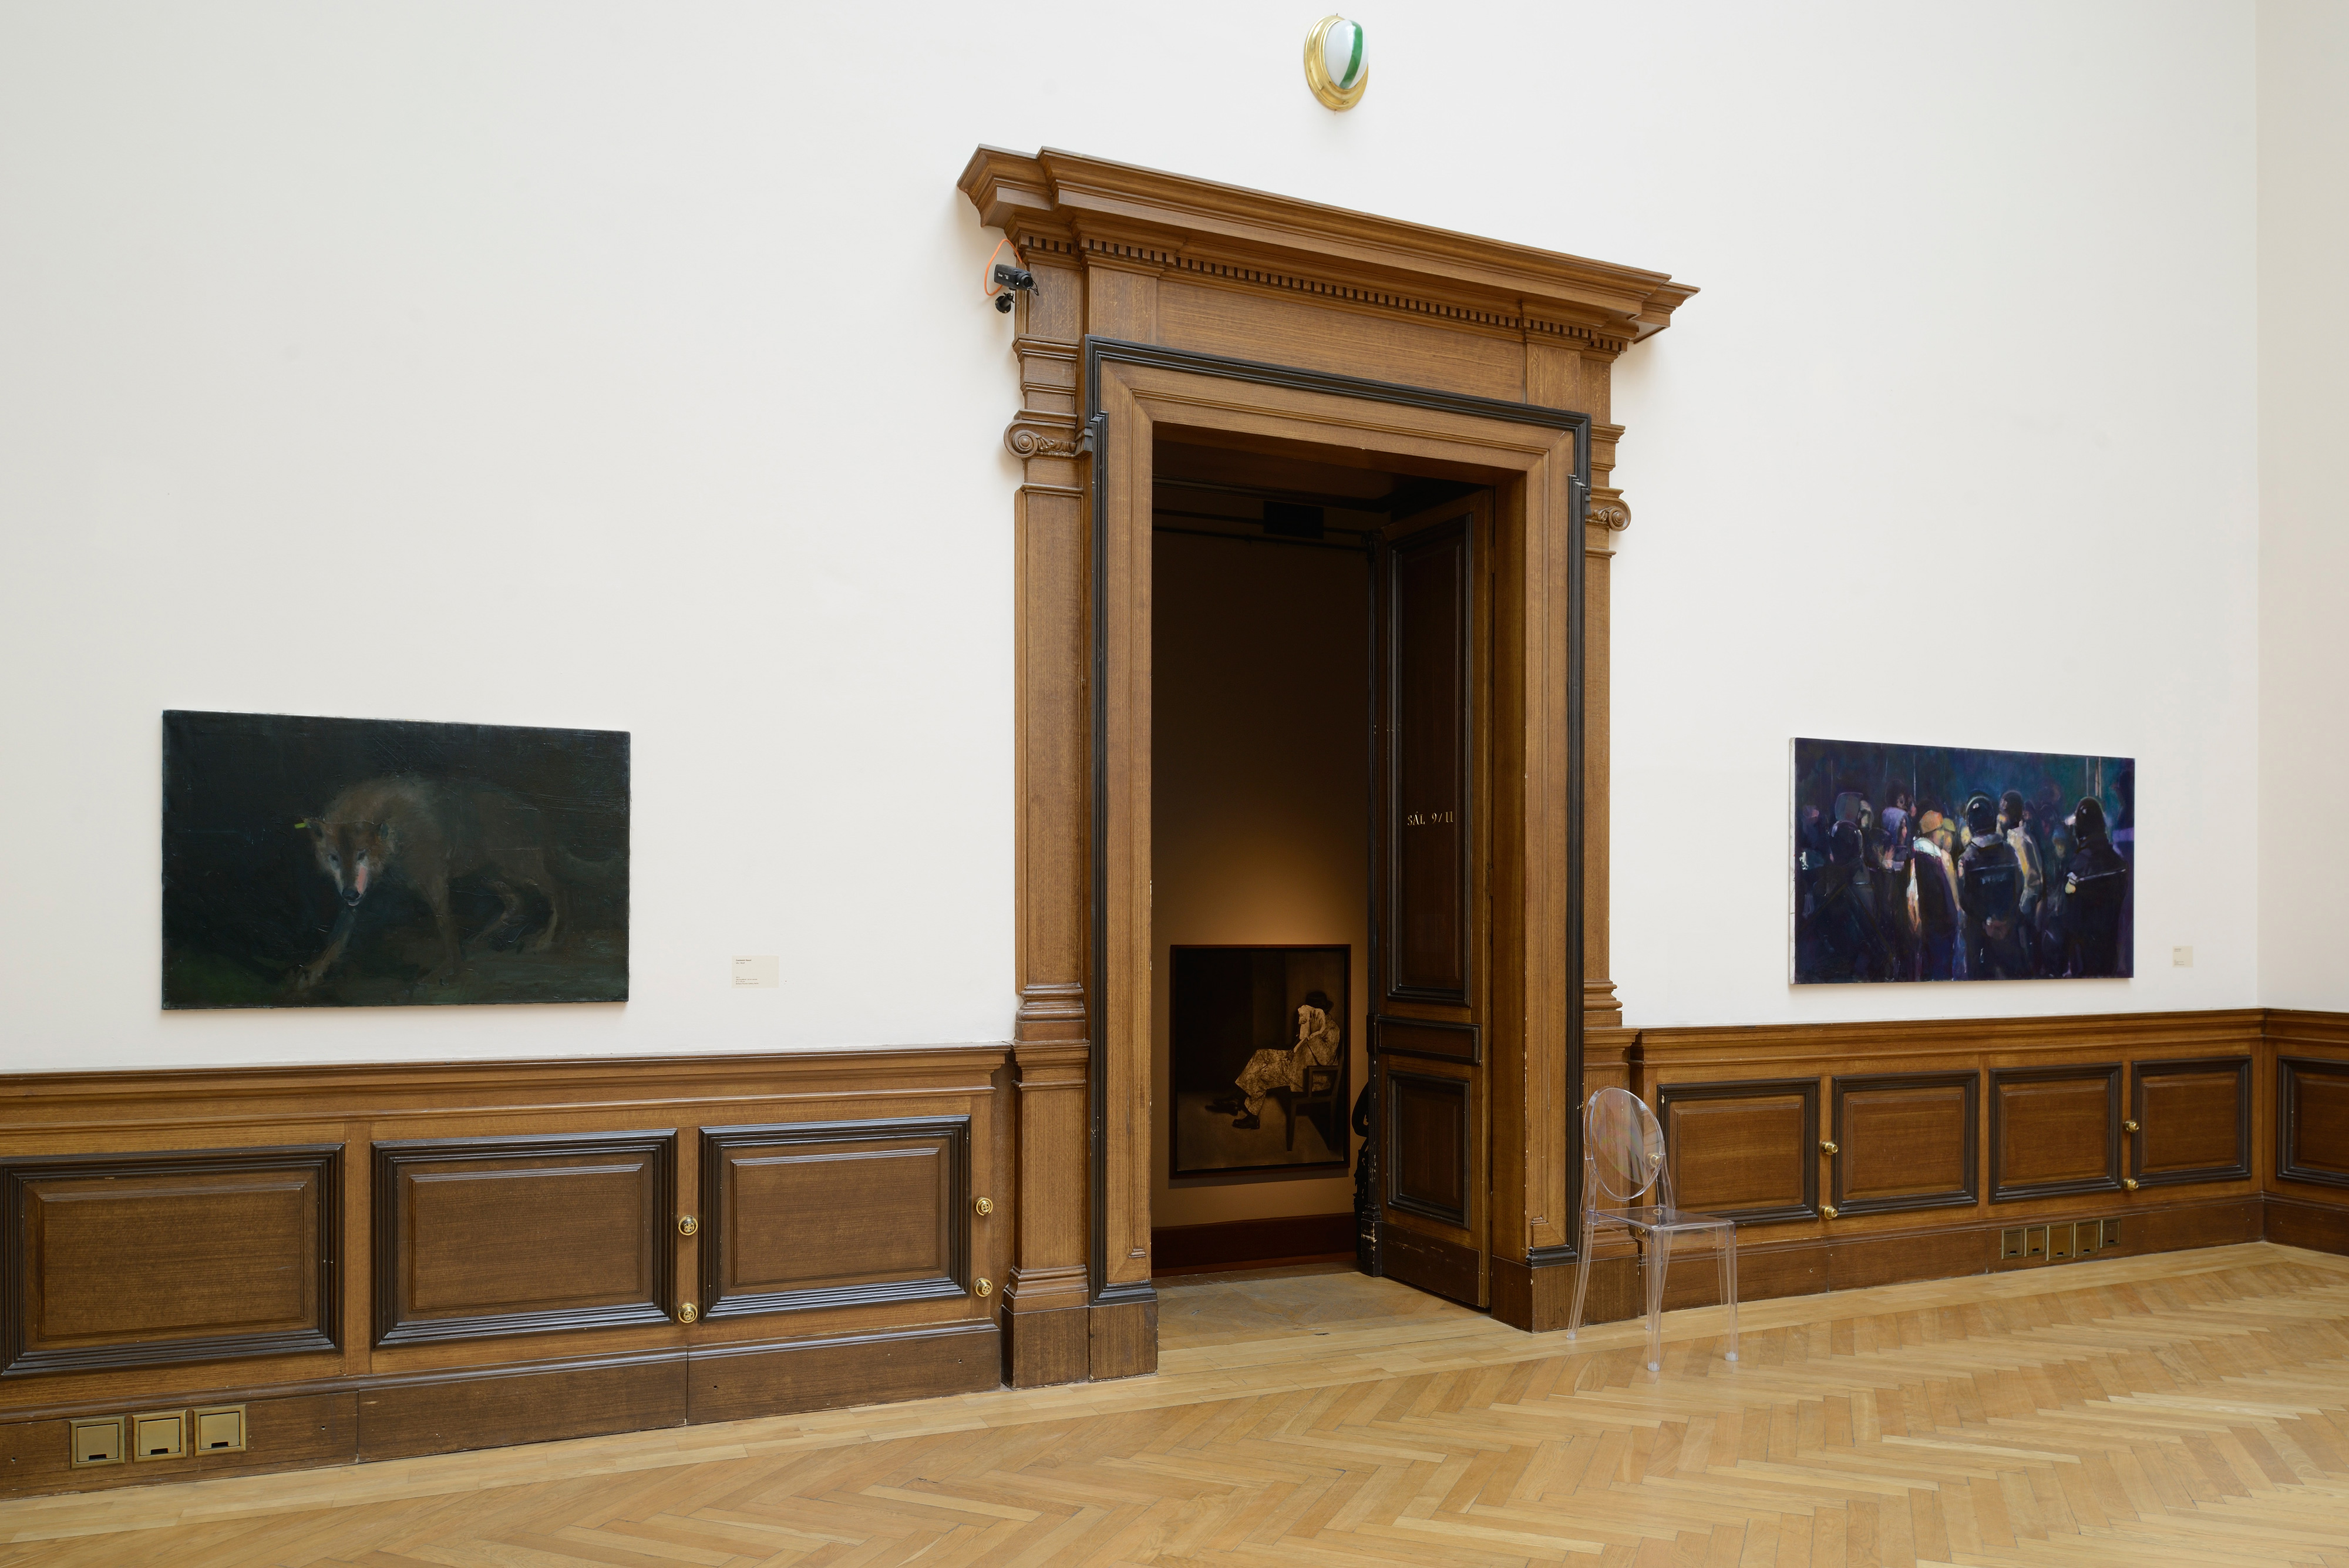 Galerie Barbara Thumm \ Simon Cantemir Hausi – Nightfall. New Tendencies in figurative painting